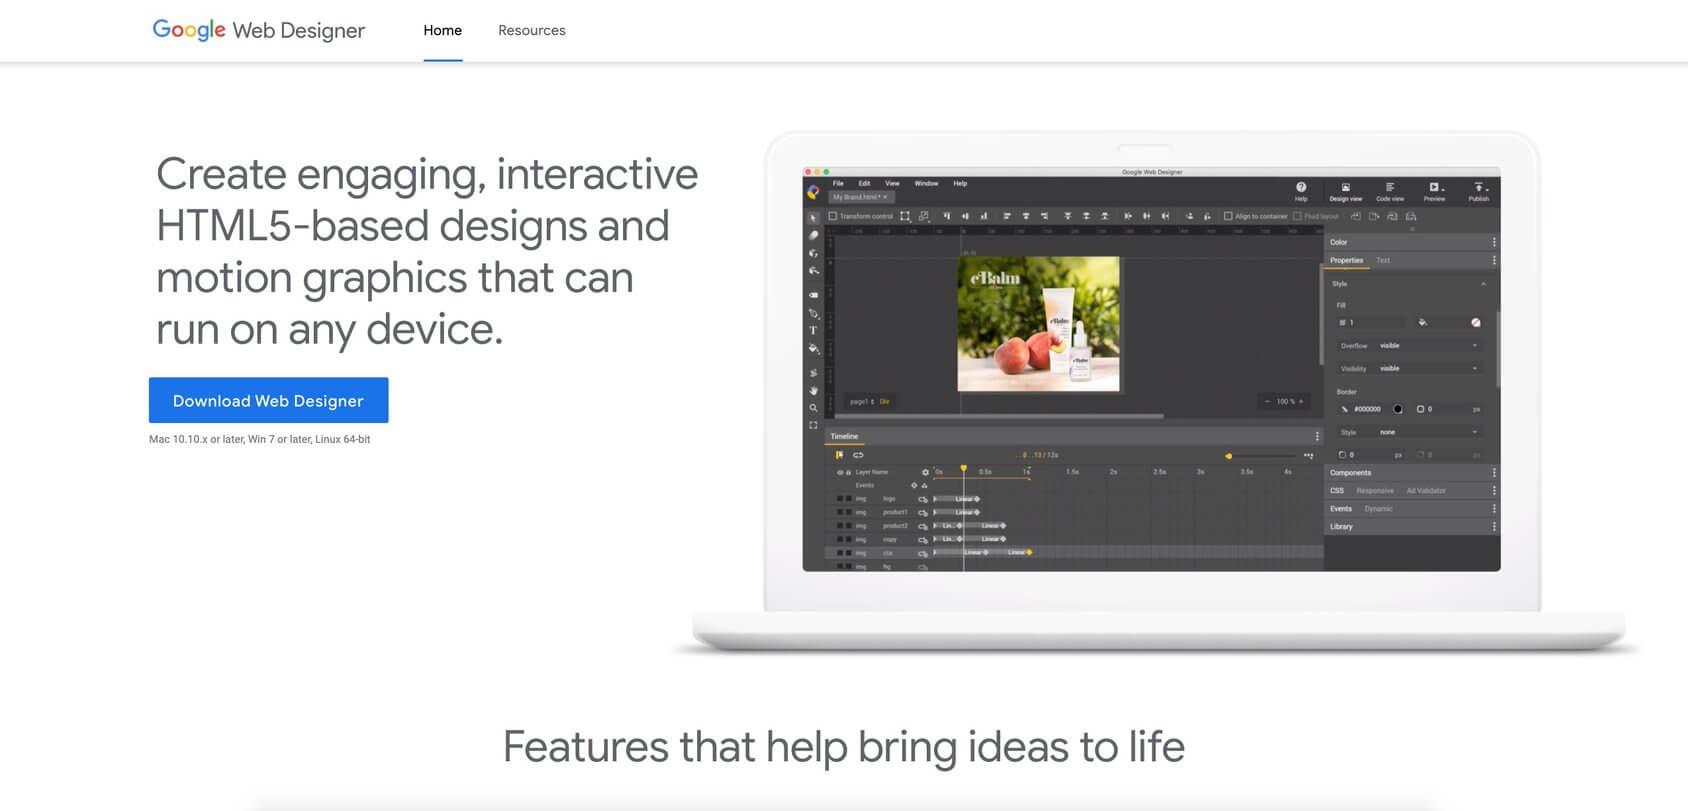 Google Web Designer homepage